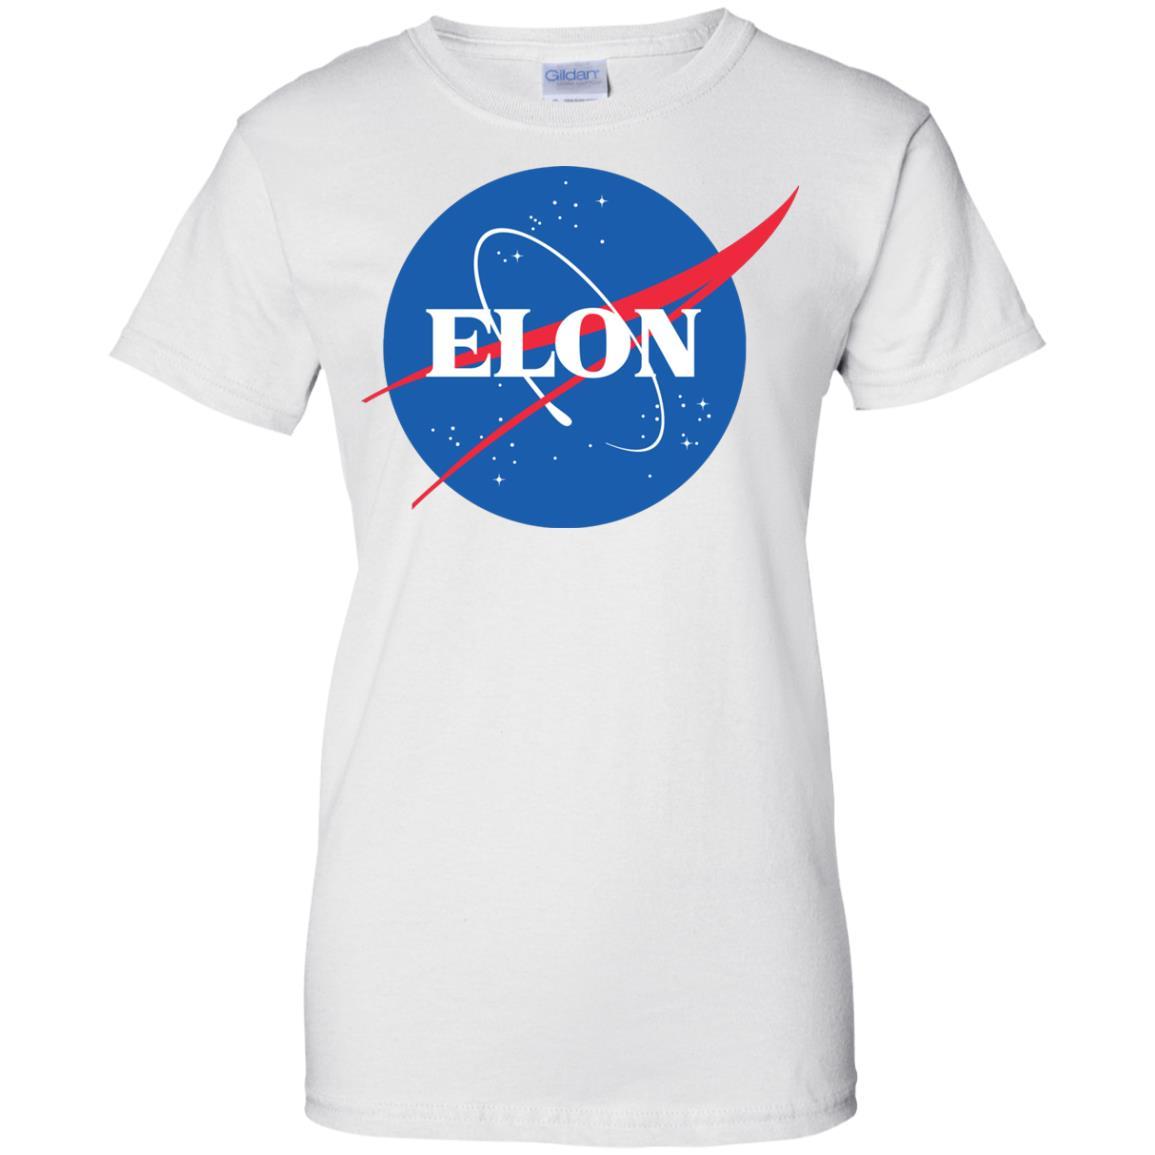 image 292px Elon Nasa parody t shirt, hoodies, tank top